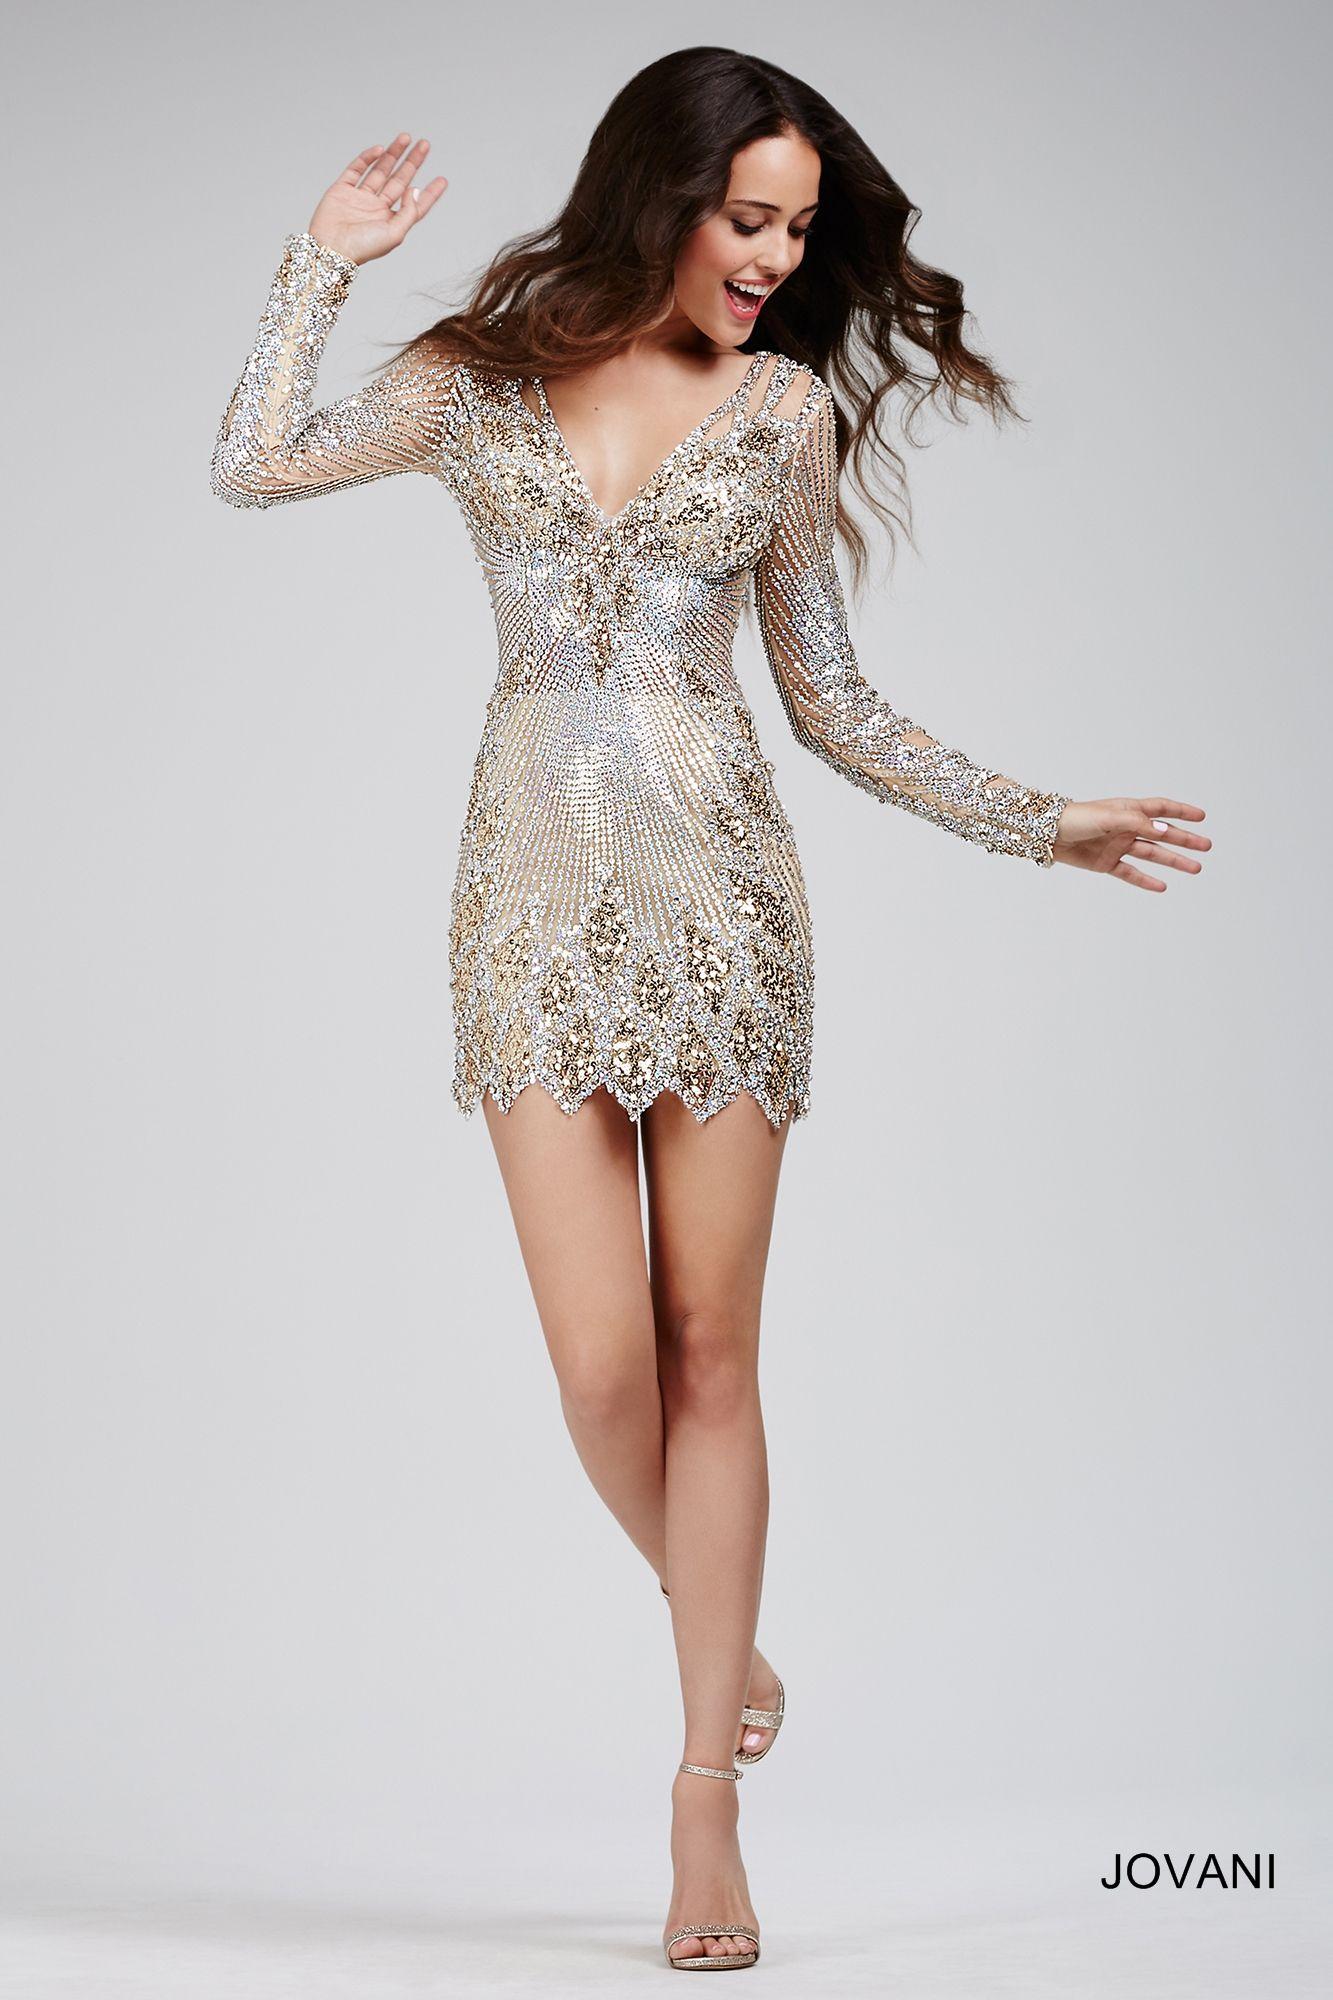 Long sleeve sequined dress dressed up pinterest dresses